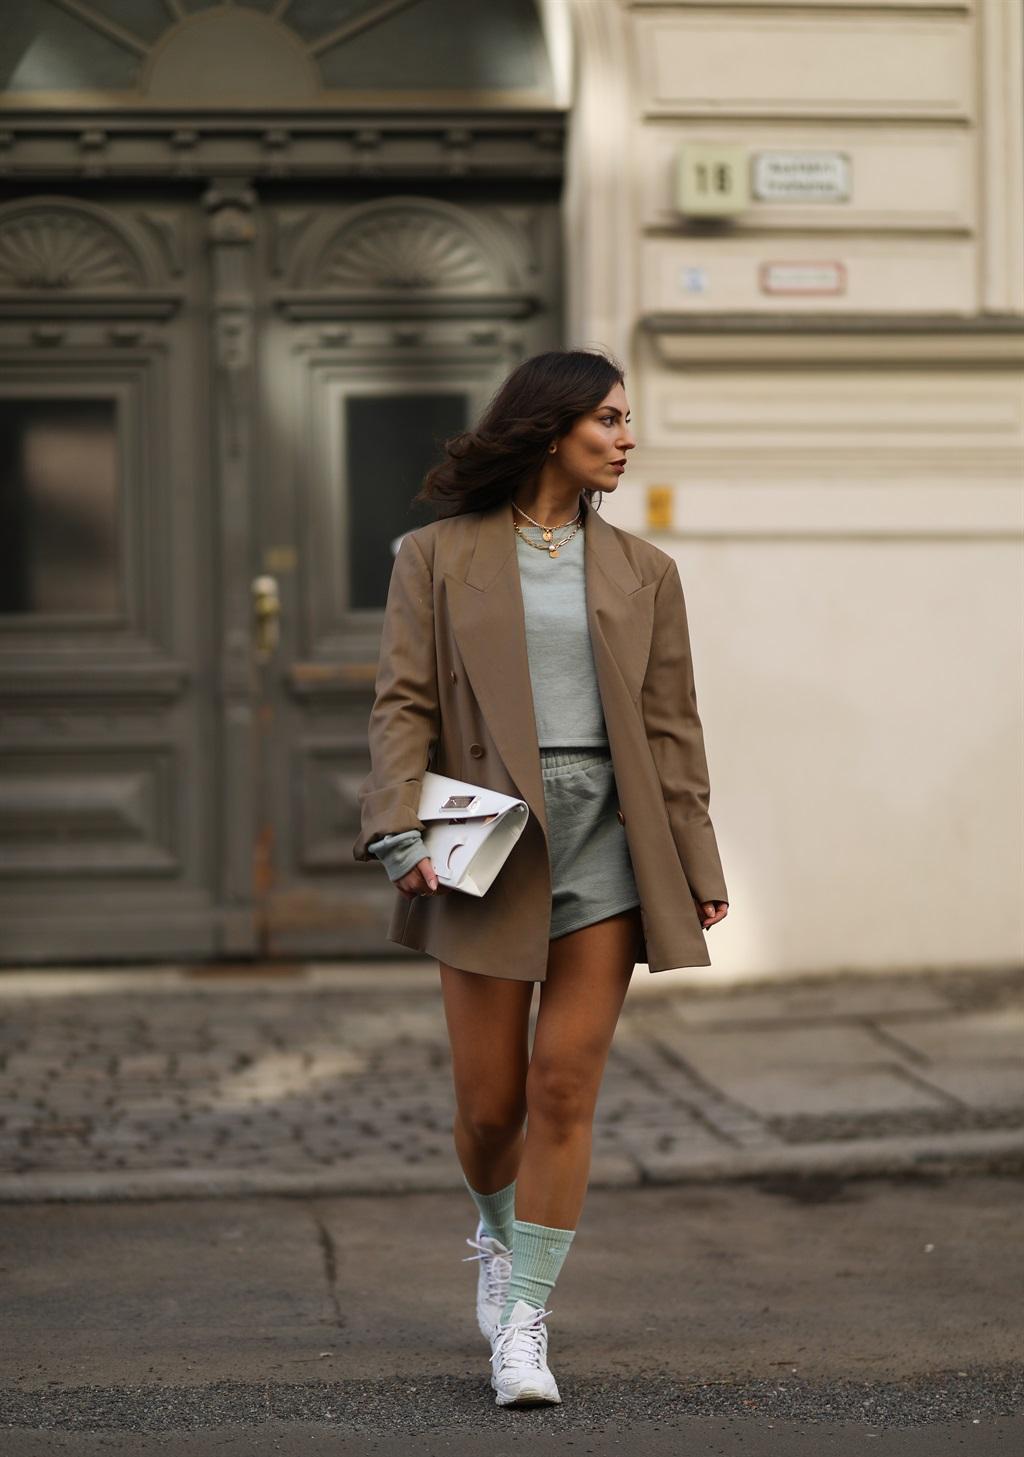 BERLIN, GERMANY - FEBRUARY 22: Masha Sedgwick wear